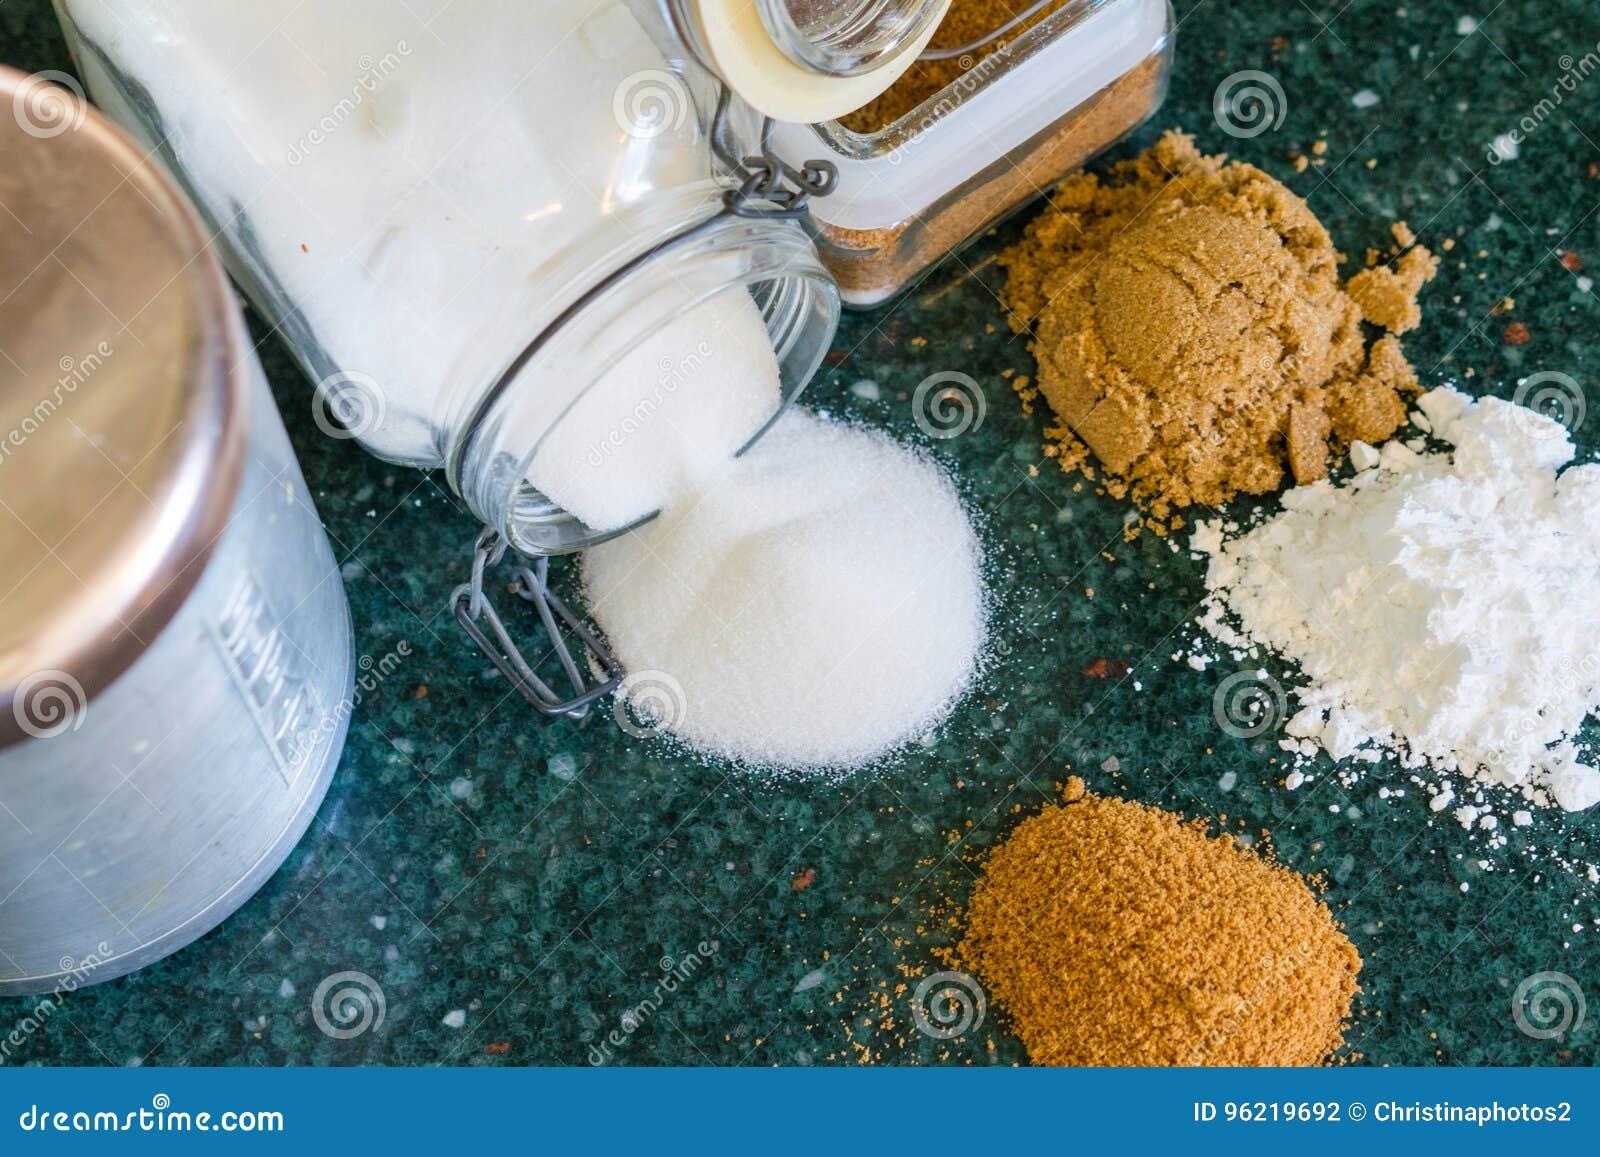 Vari tipi di zuccheri